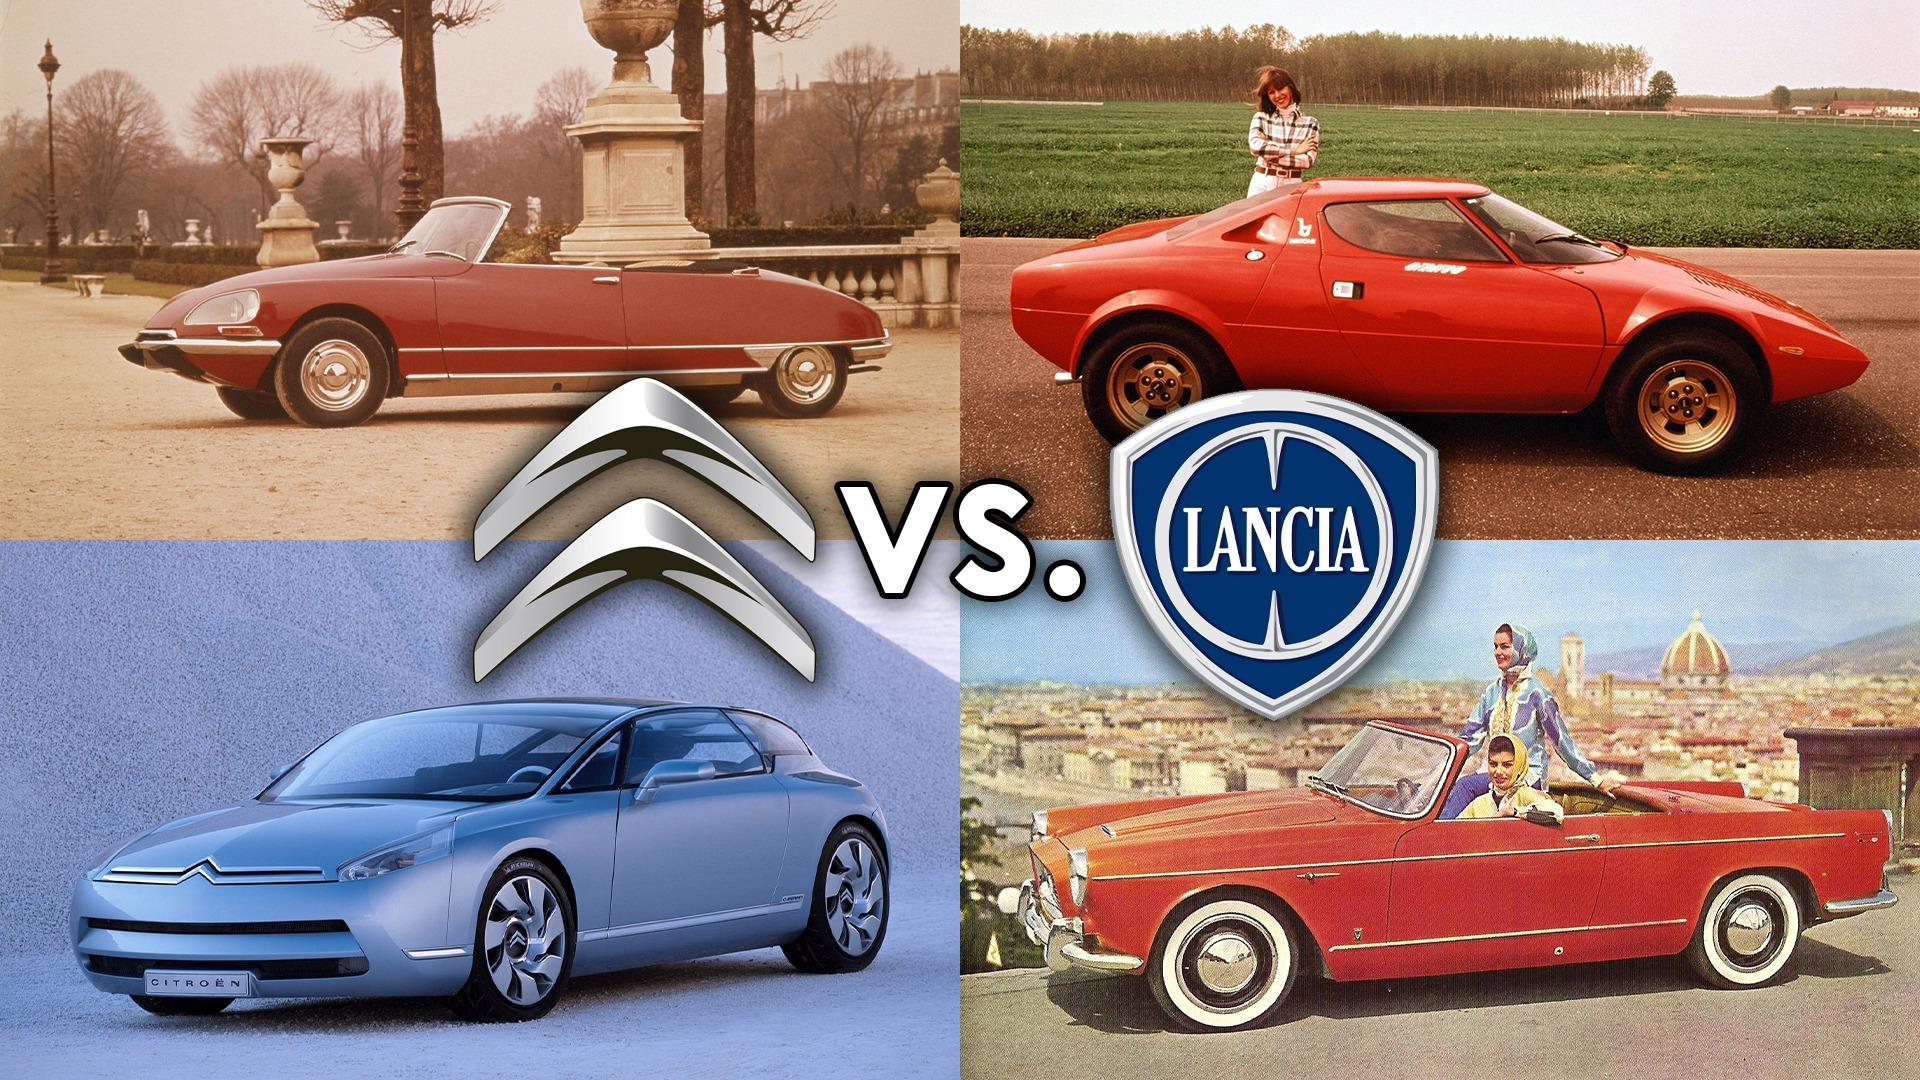 Lordens garasje ep.38 – Citroën vs. Lancia